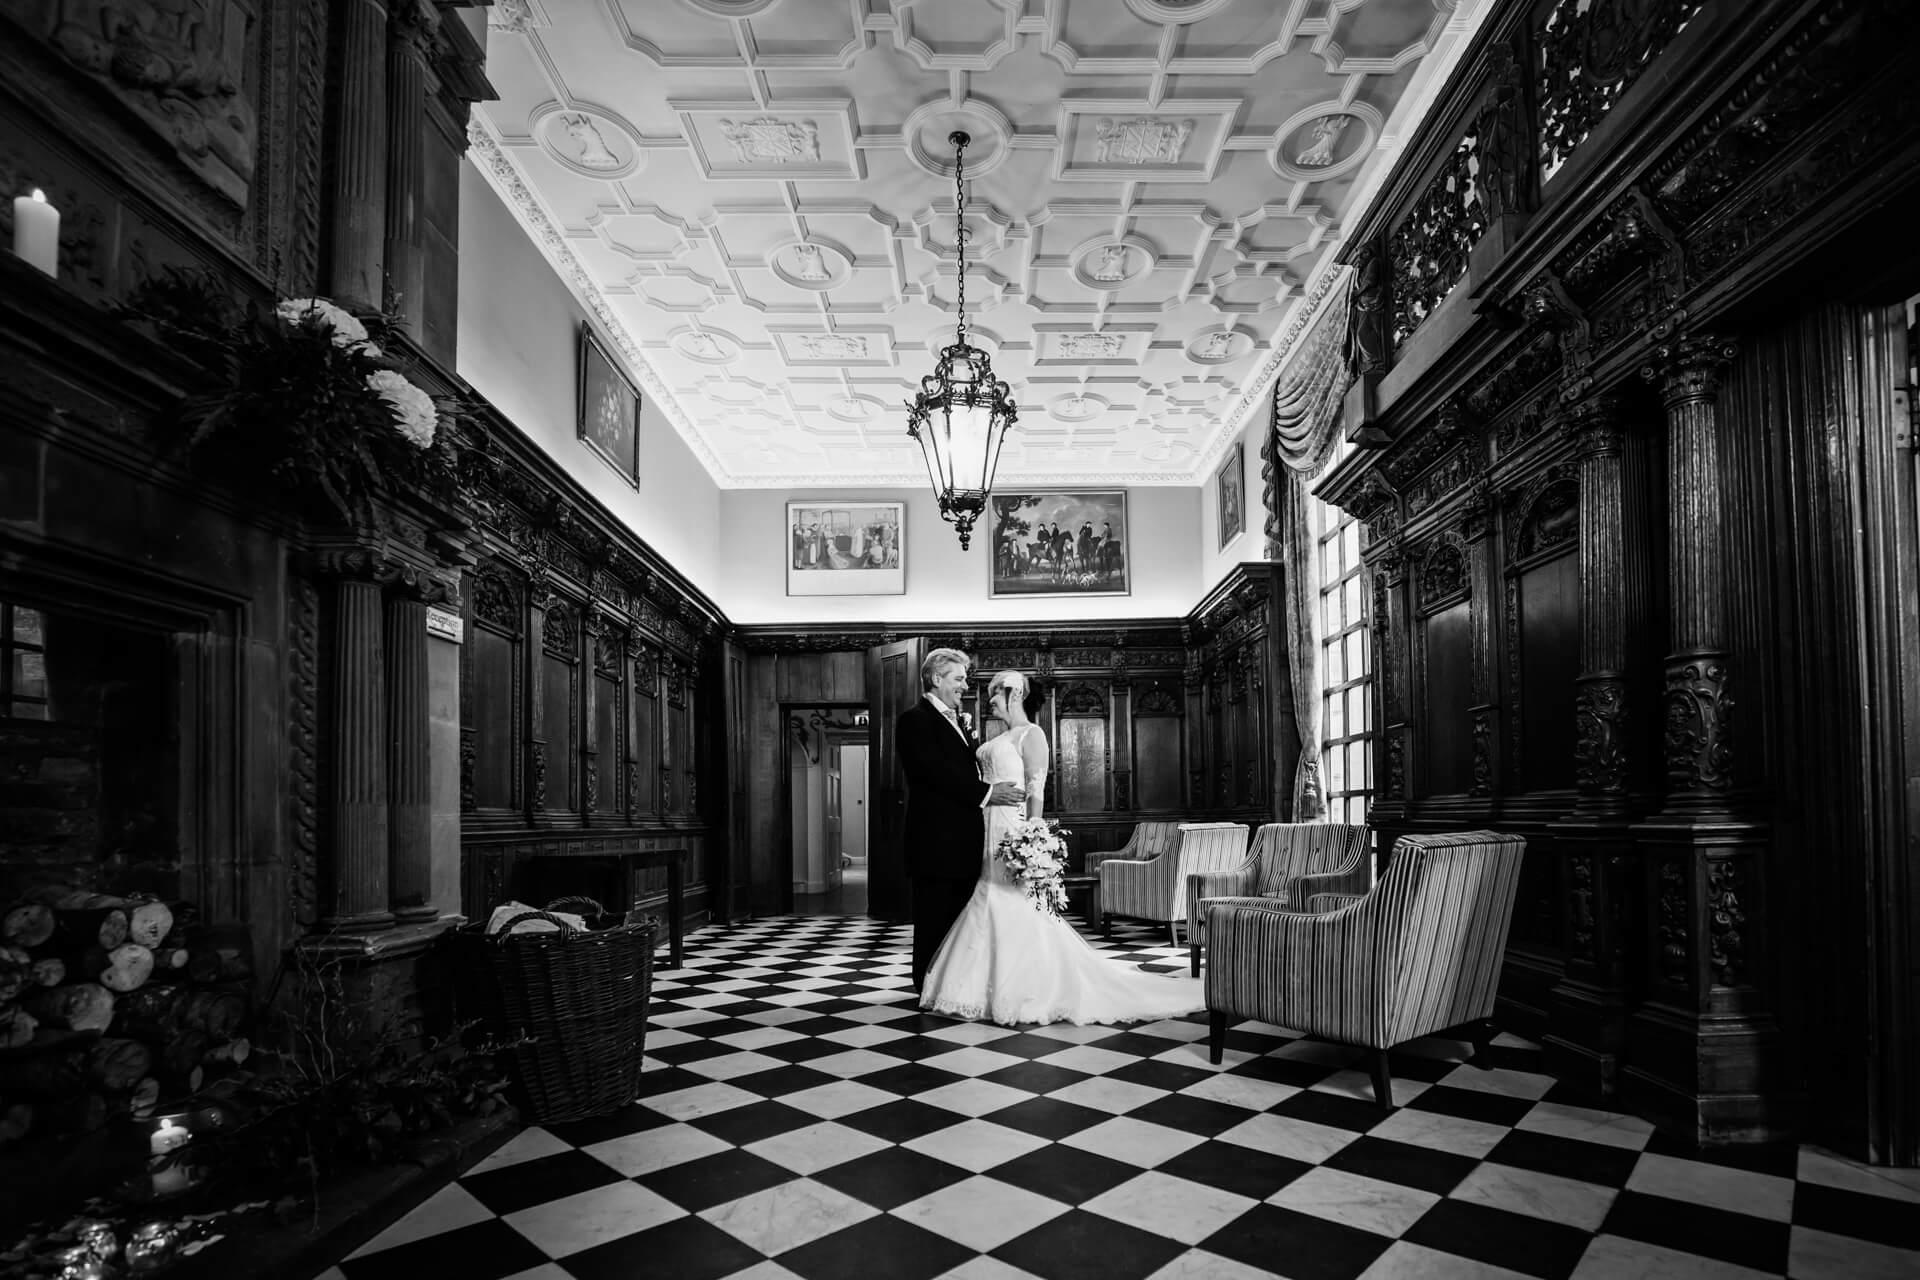 Hazlewood Castle wedding photographer - wedding couple inside the castle